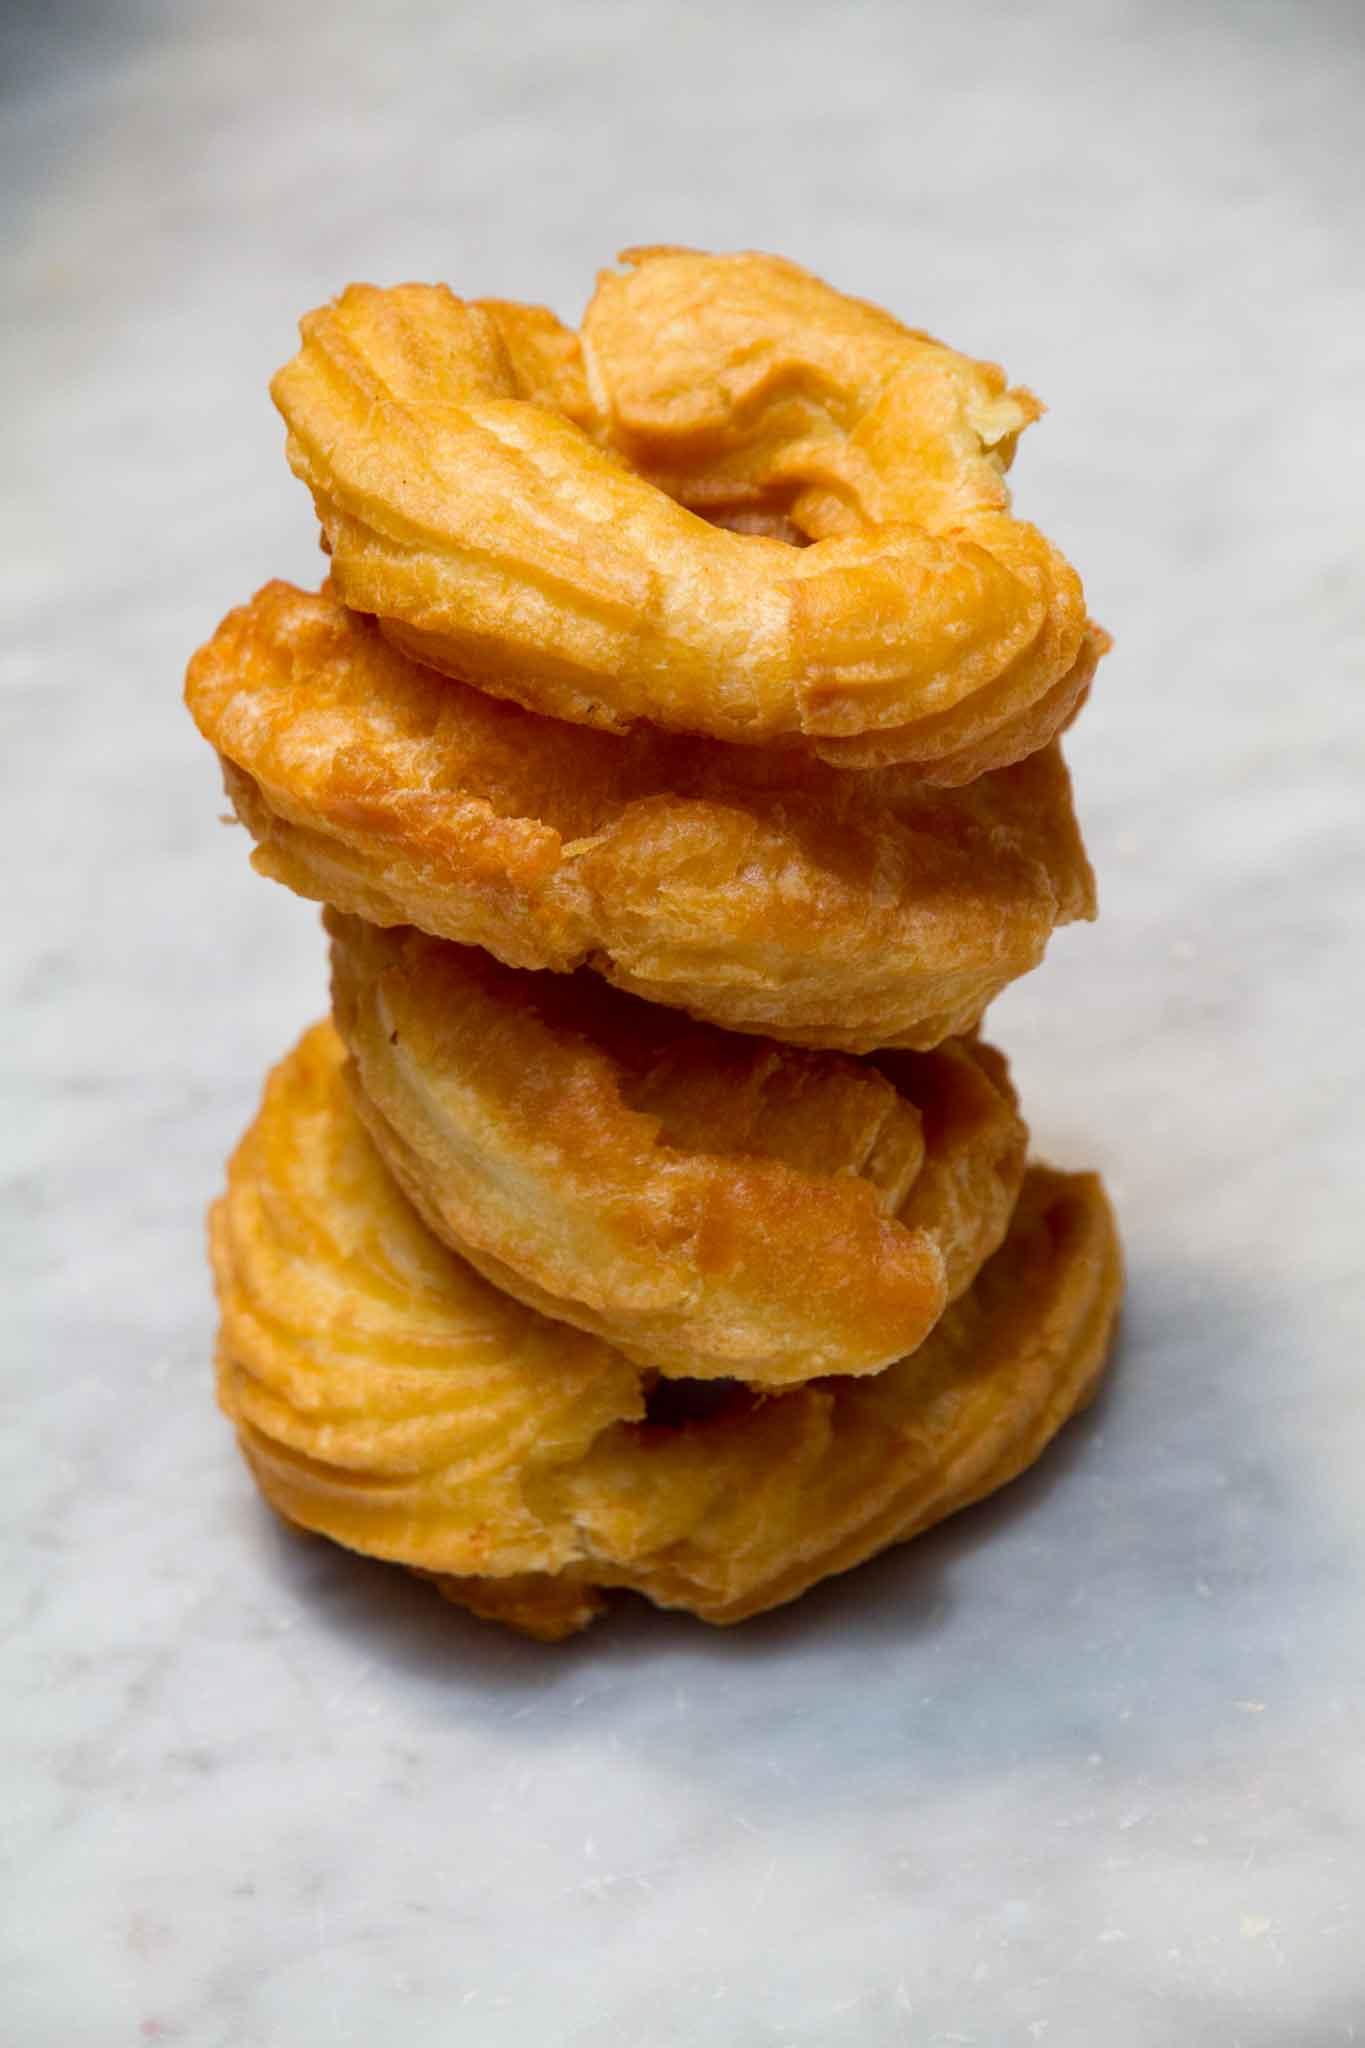 zeppole San Giuseppe fritte